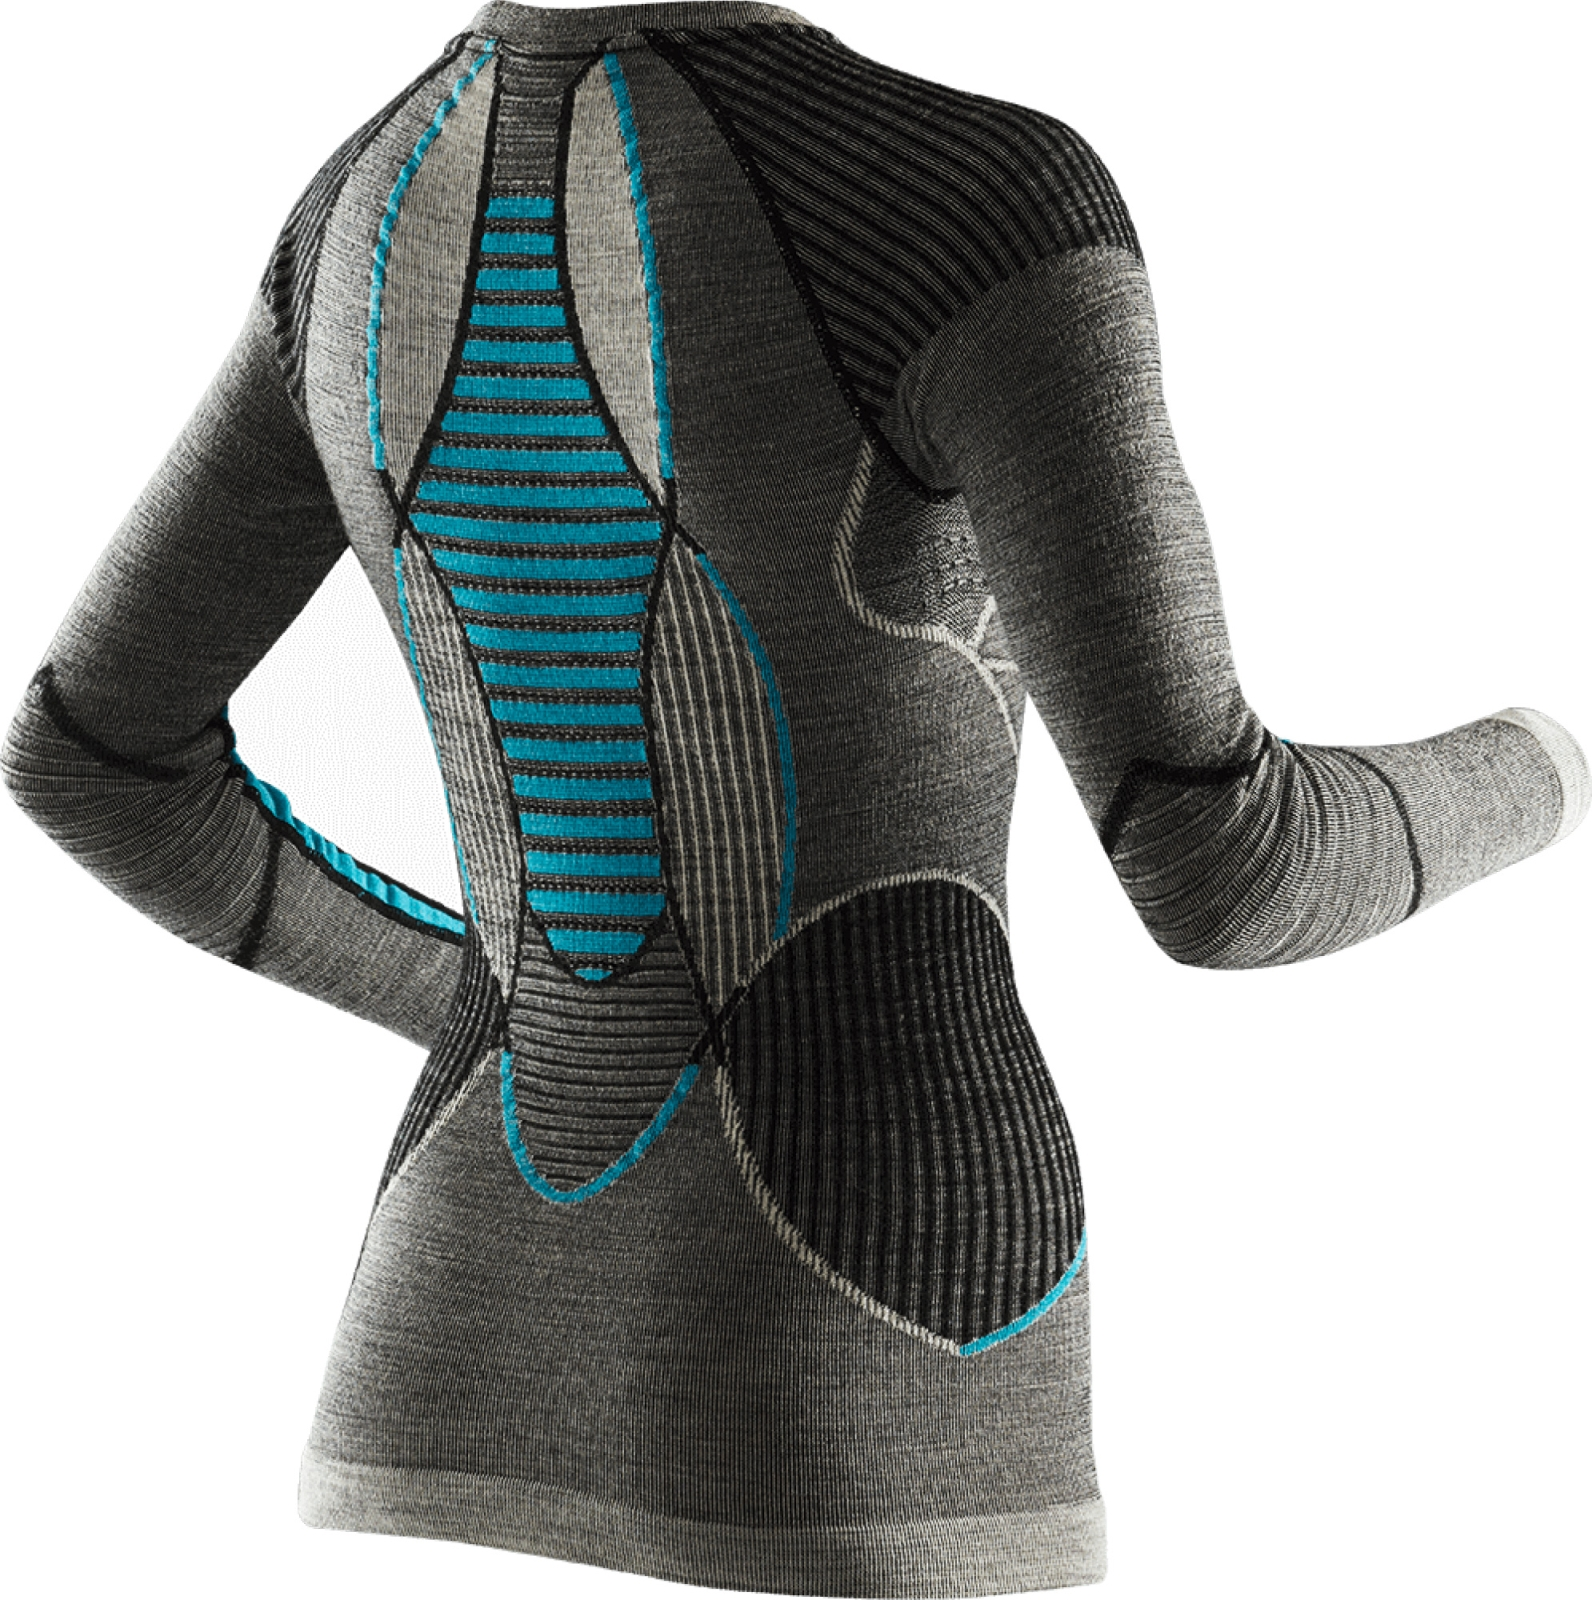 Dámské funkční tričko Apani Merino By X-Bionic Fastflow Shirt Long Round  Neck Women - 9e4aab9434